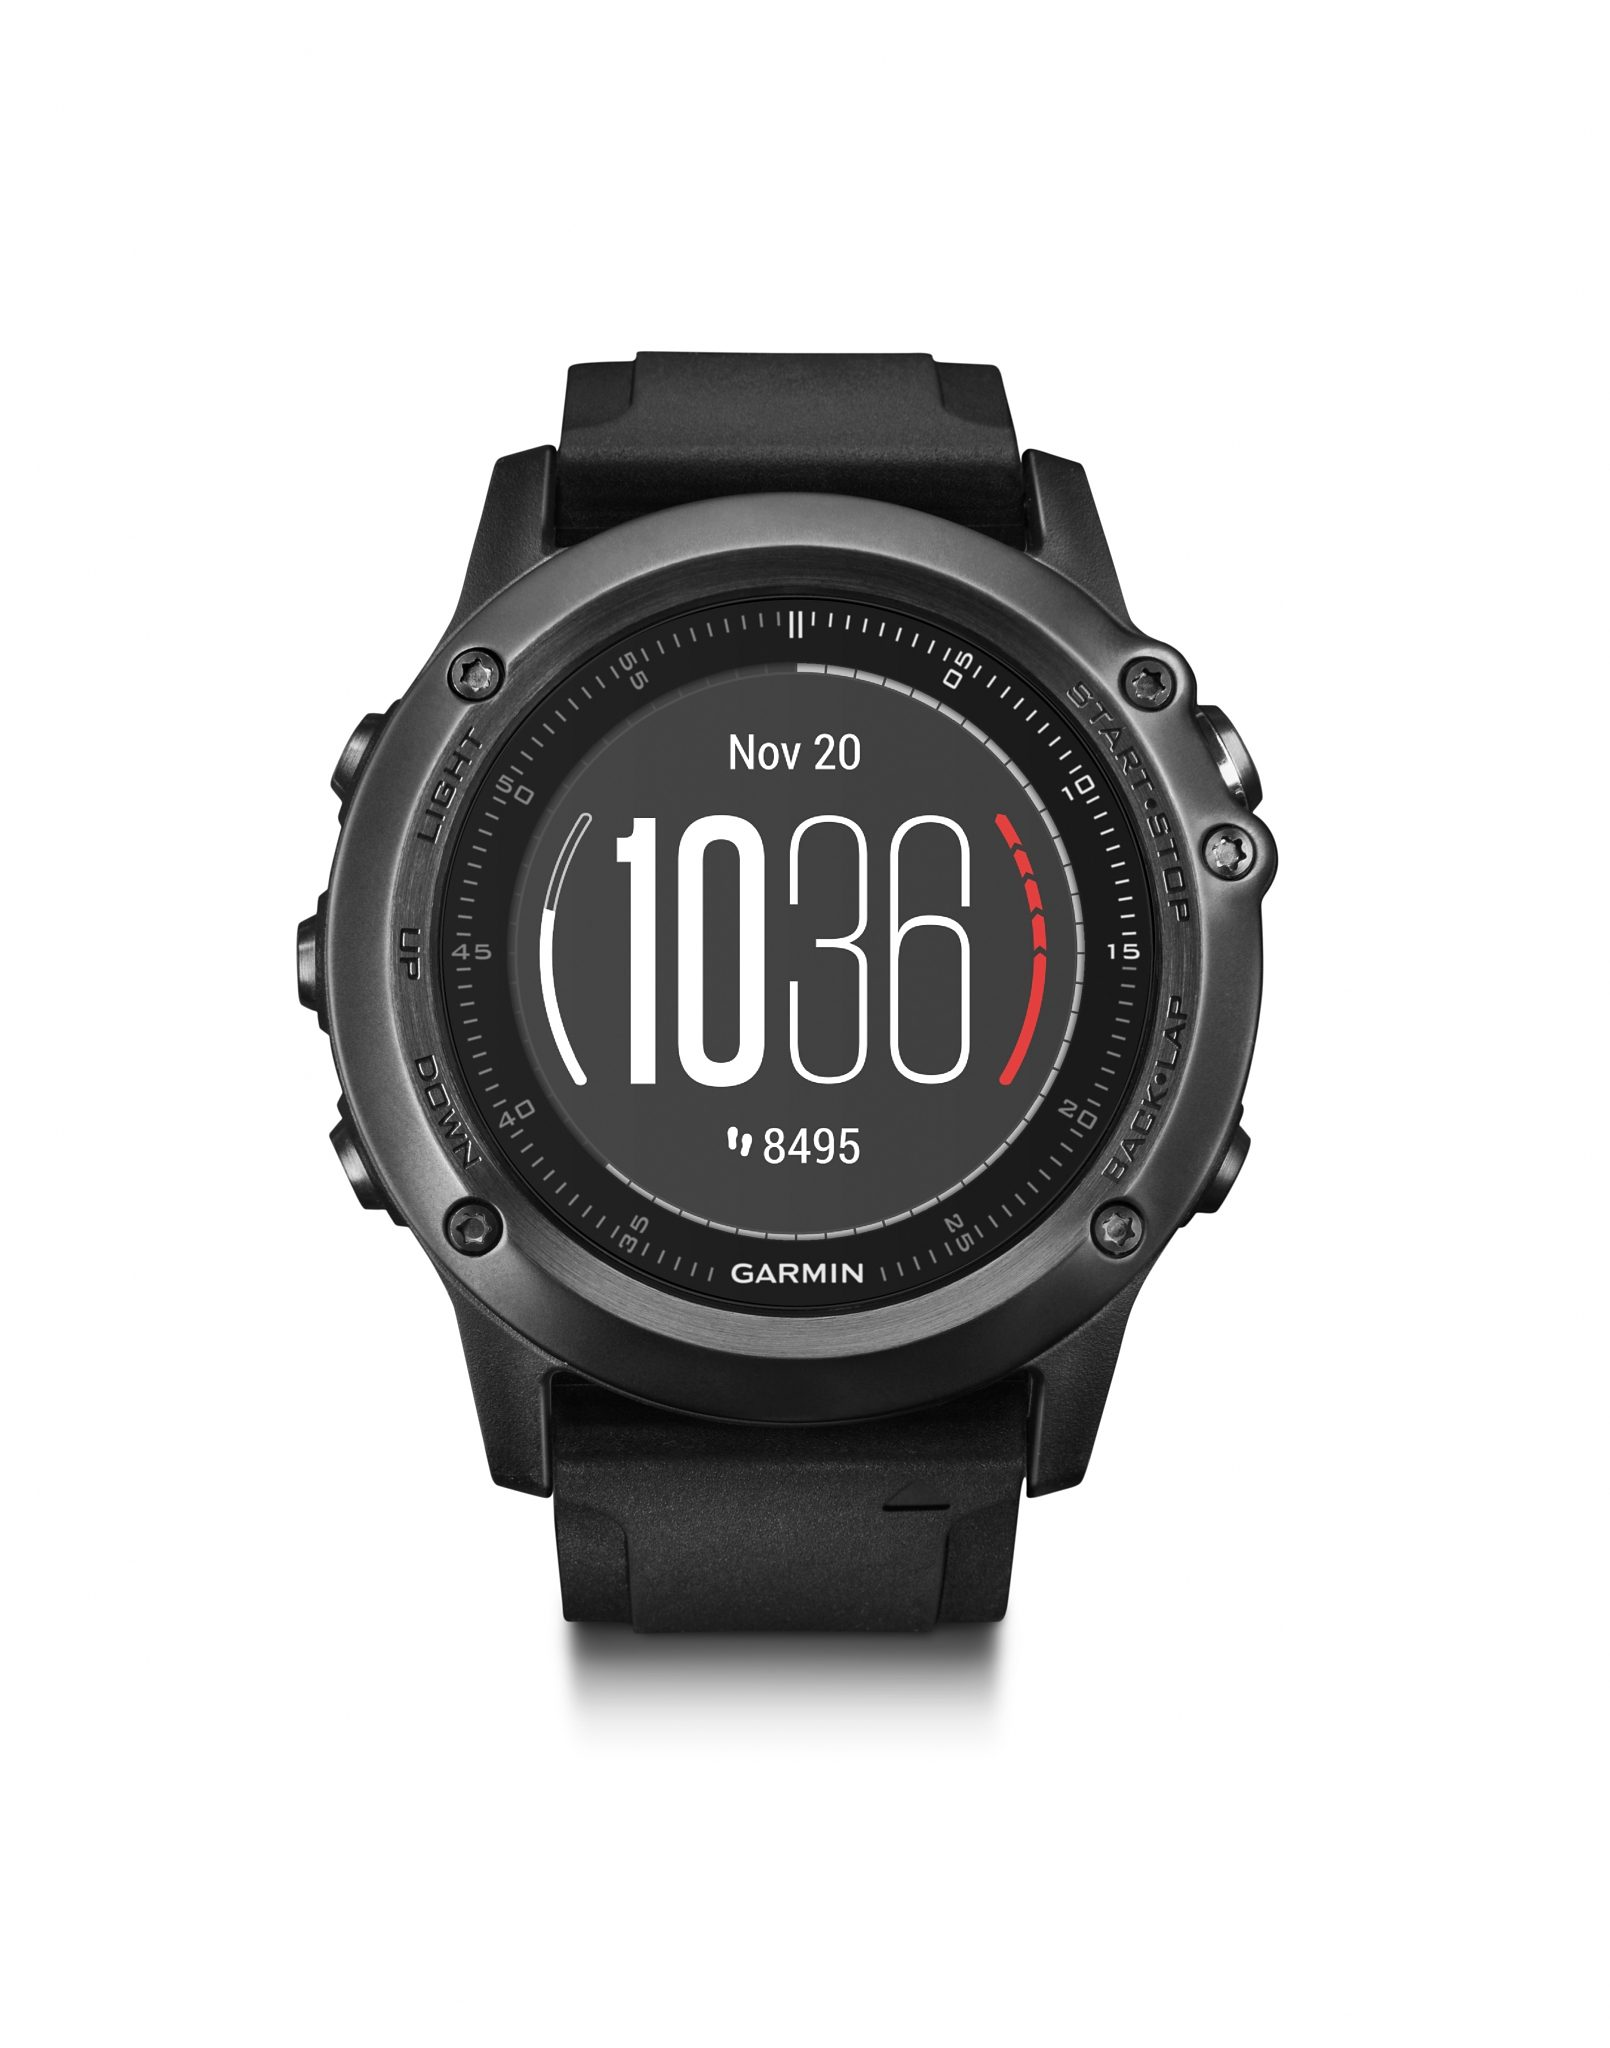 Garmin Sportuhr »fenix 3 HR Saphir GPS Multisportuhr«